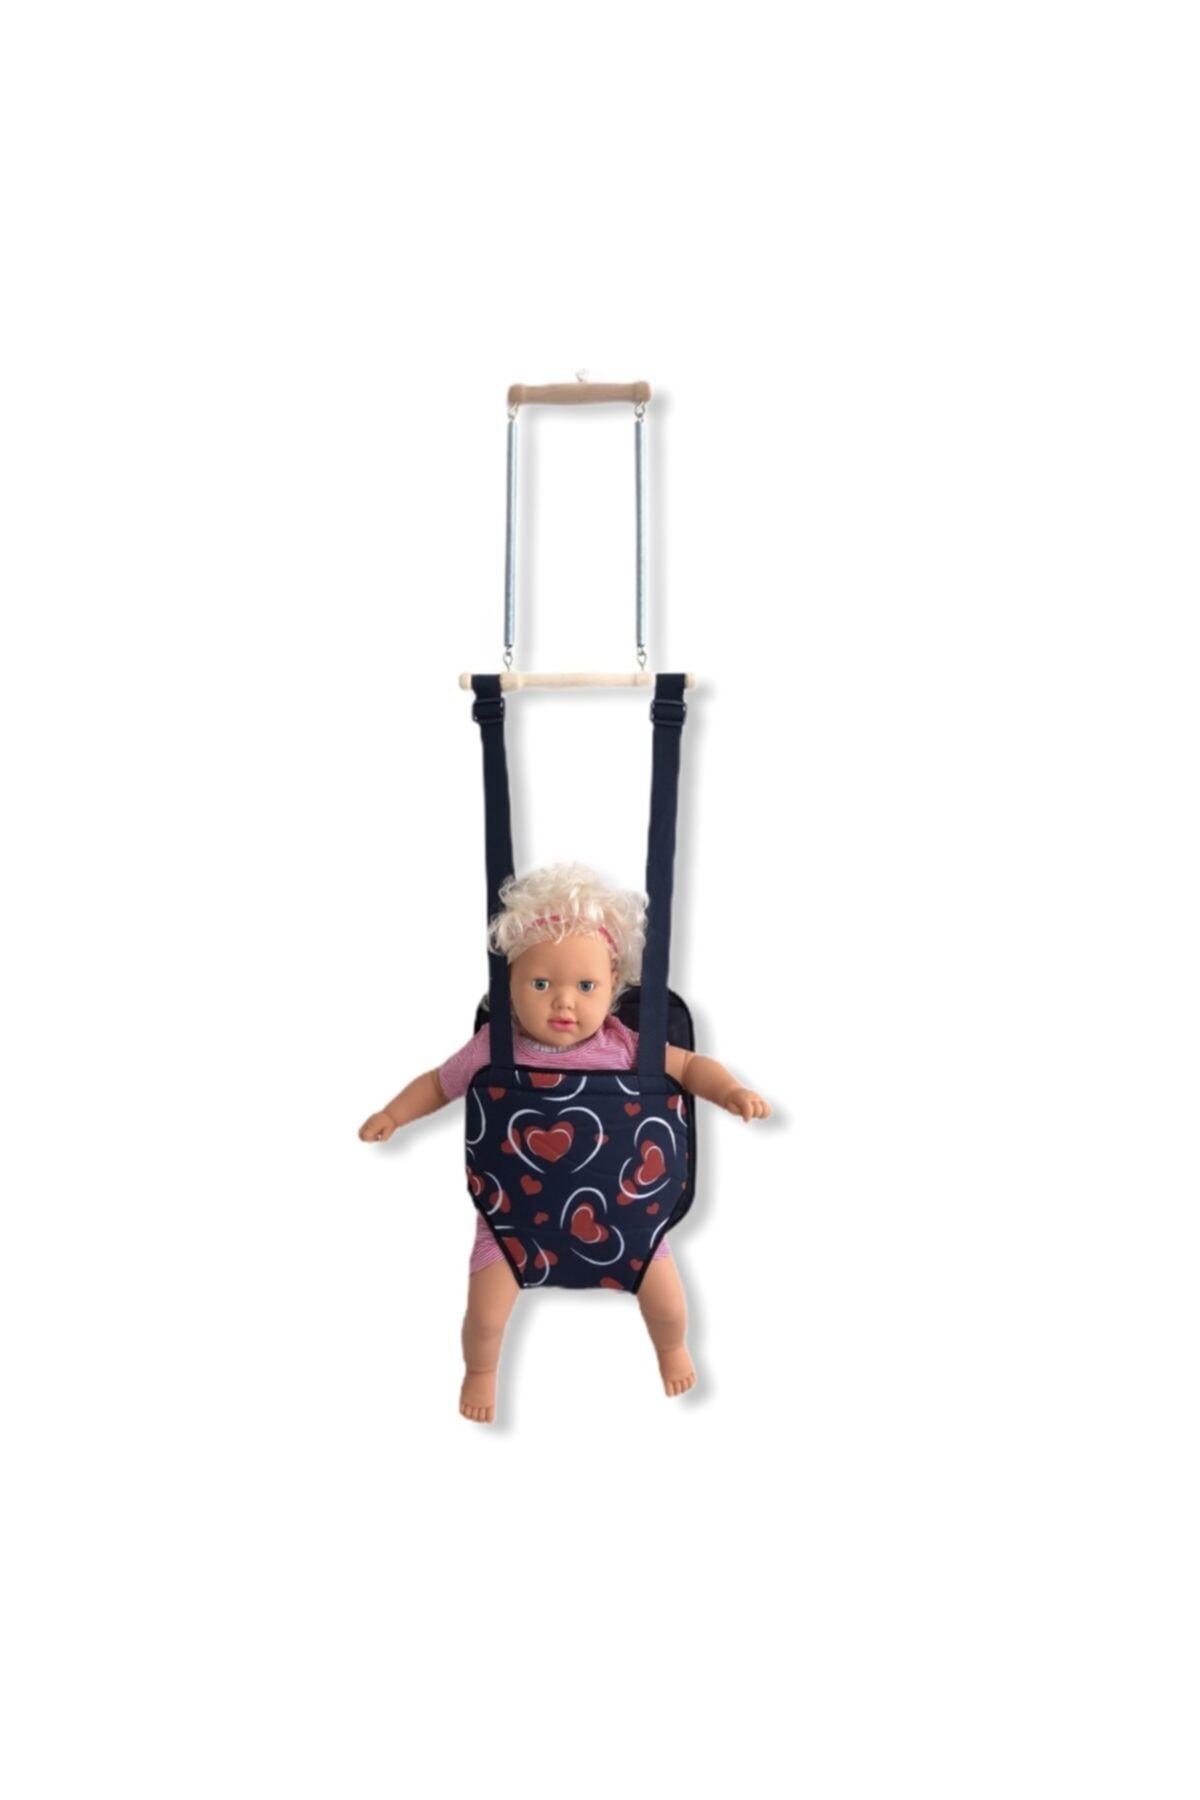 PENDO BABY Kız-erkek Bebek Hoppala (zıp Zıp) 1